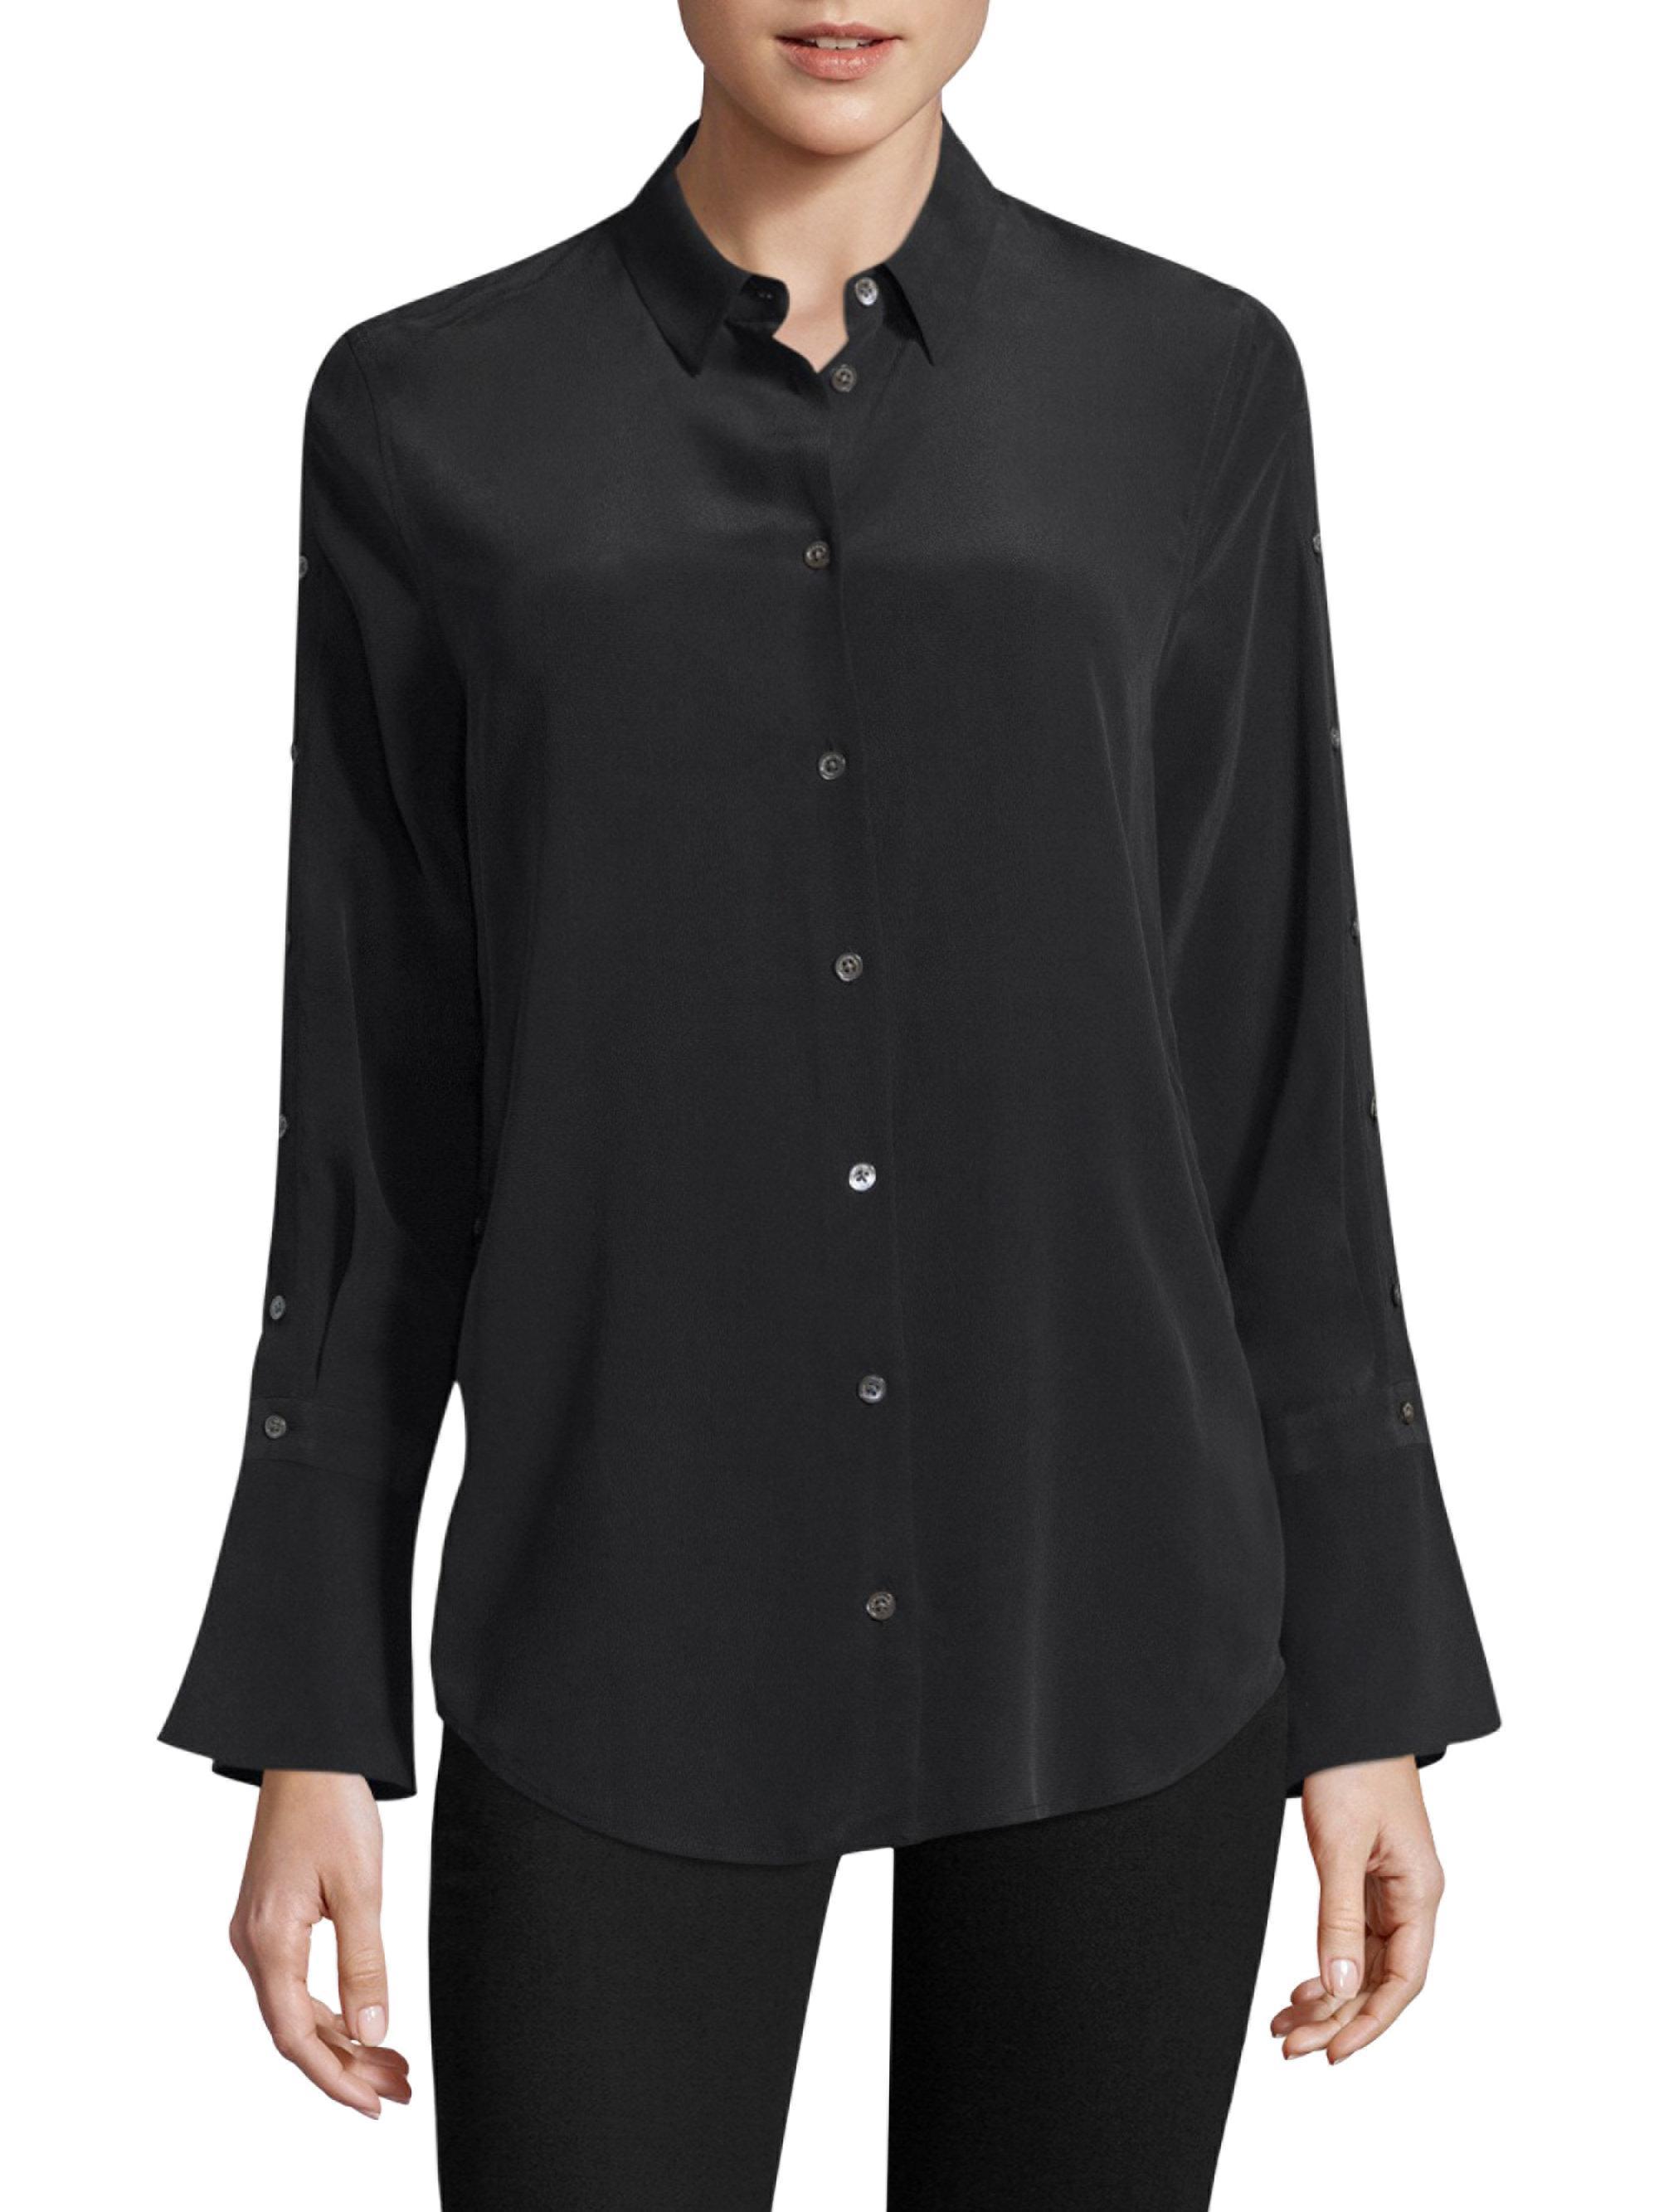 Lyst equipment rossi button sleeve shirt in black for Equipment black silk shirt